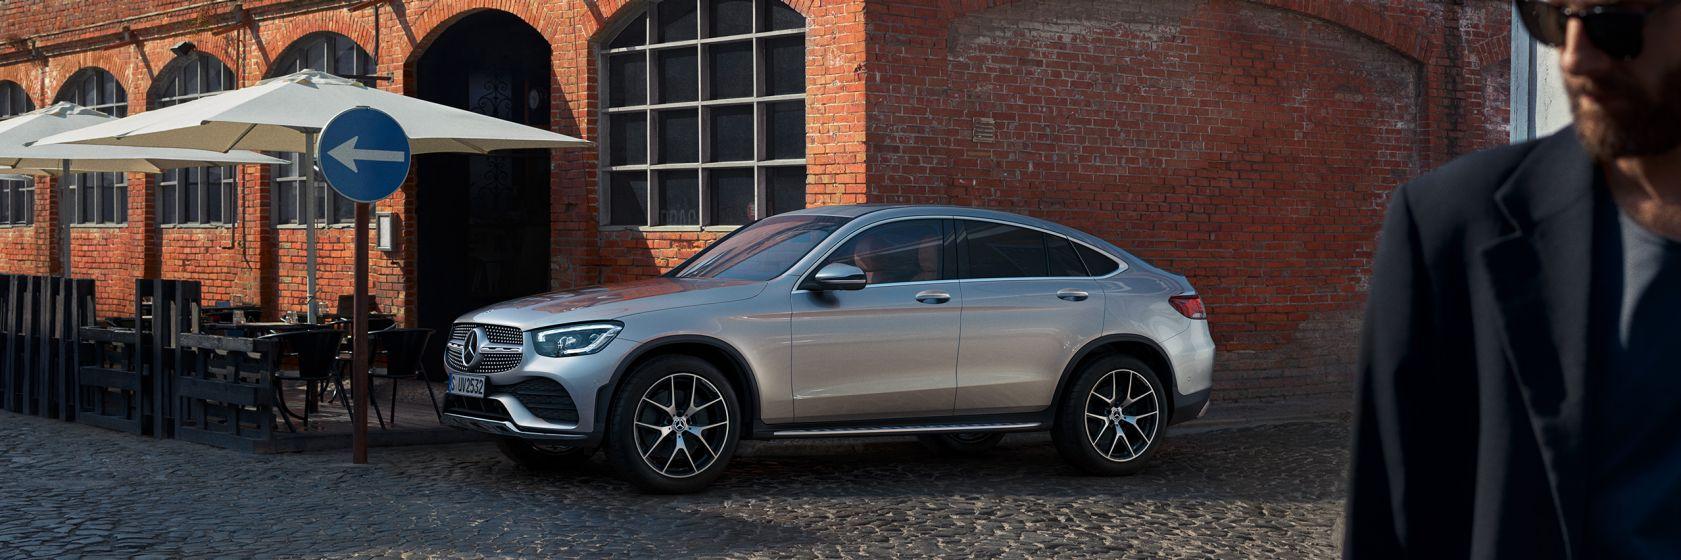 Дизайн Mercedes–Benz GLC Coupe 2020